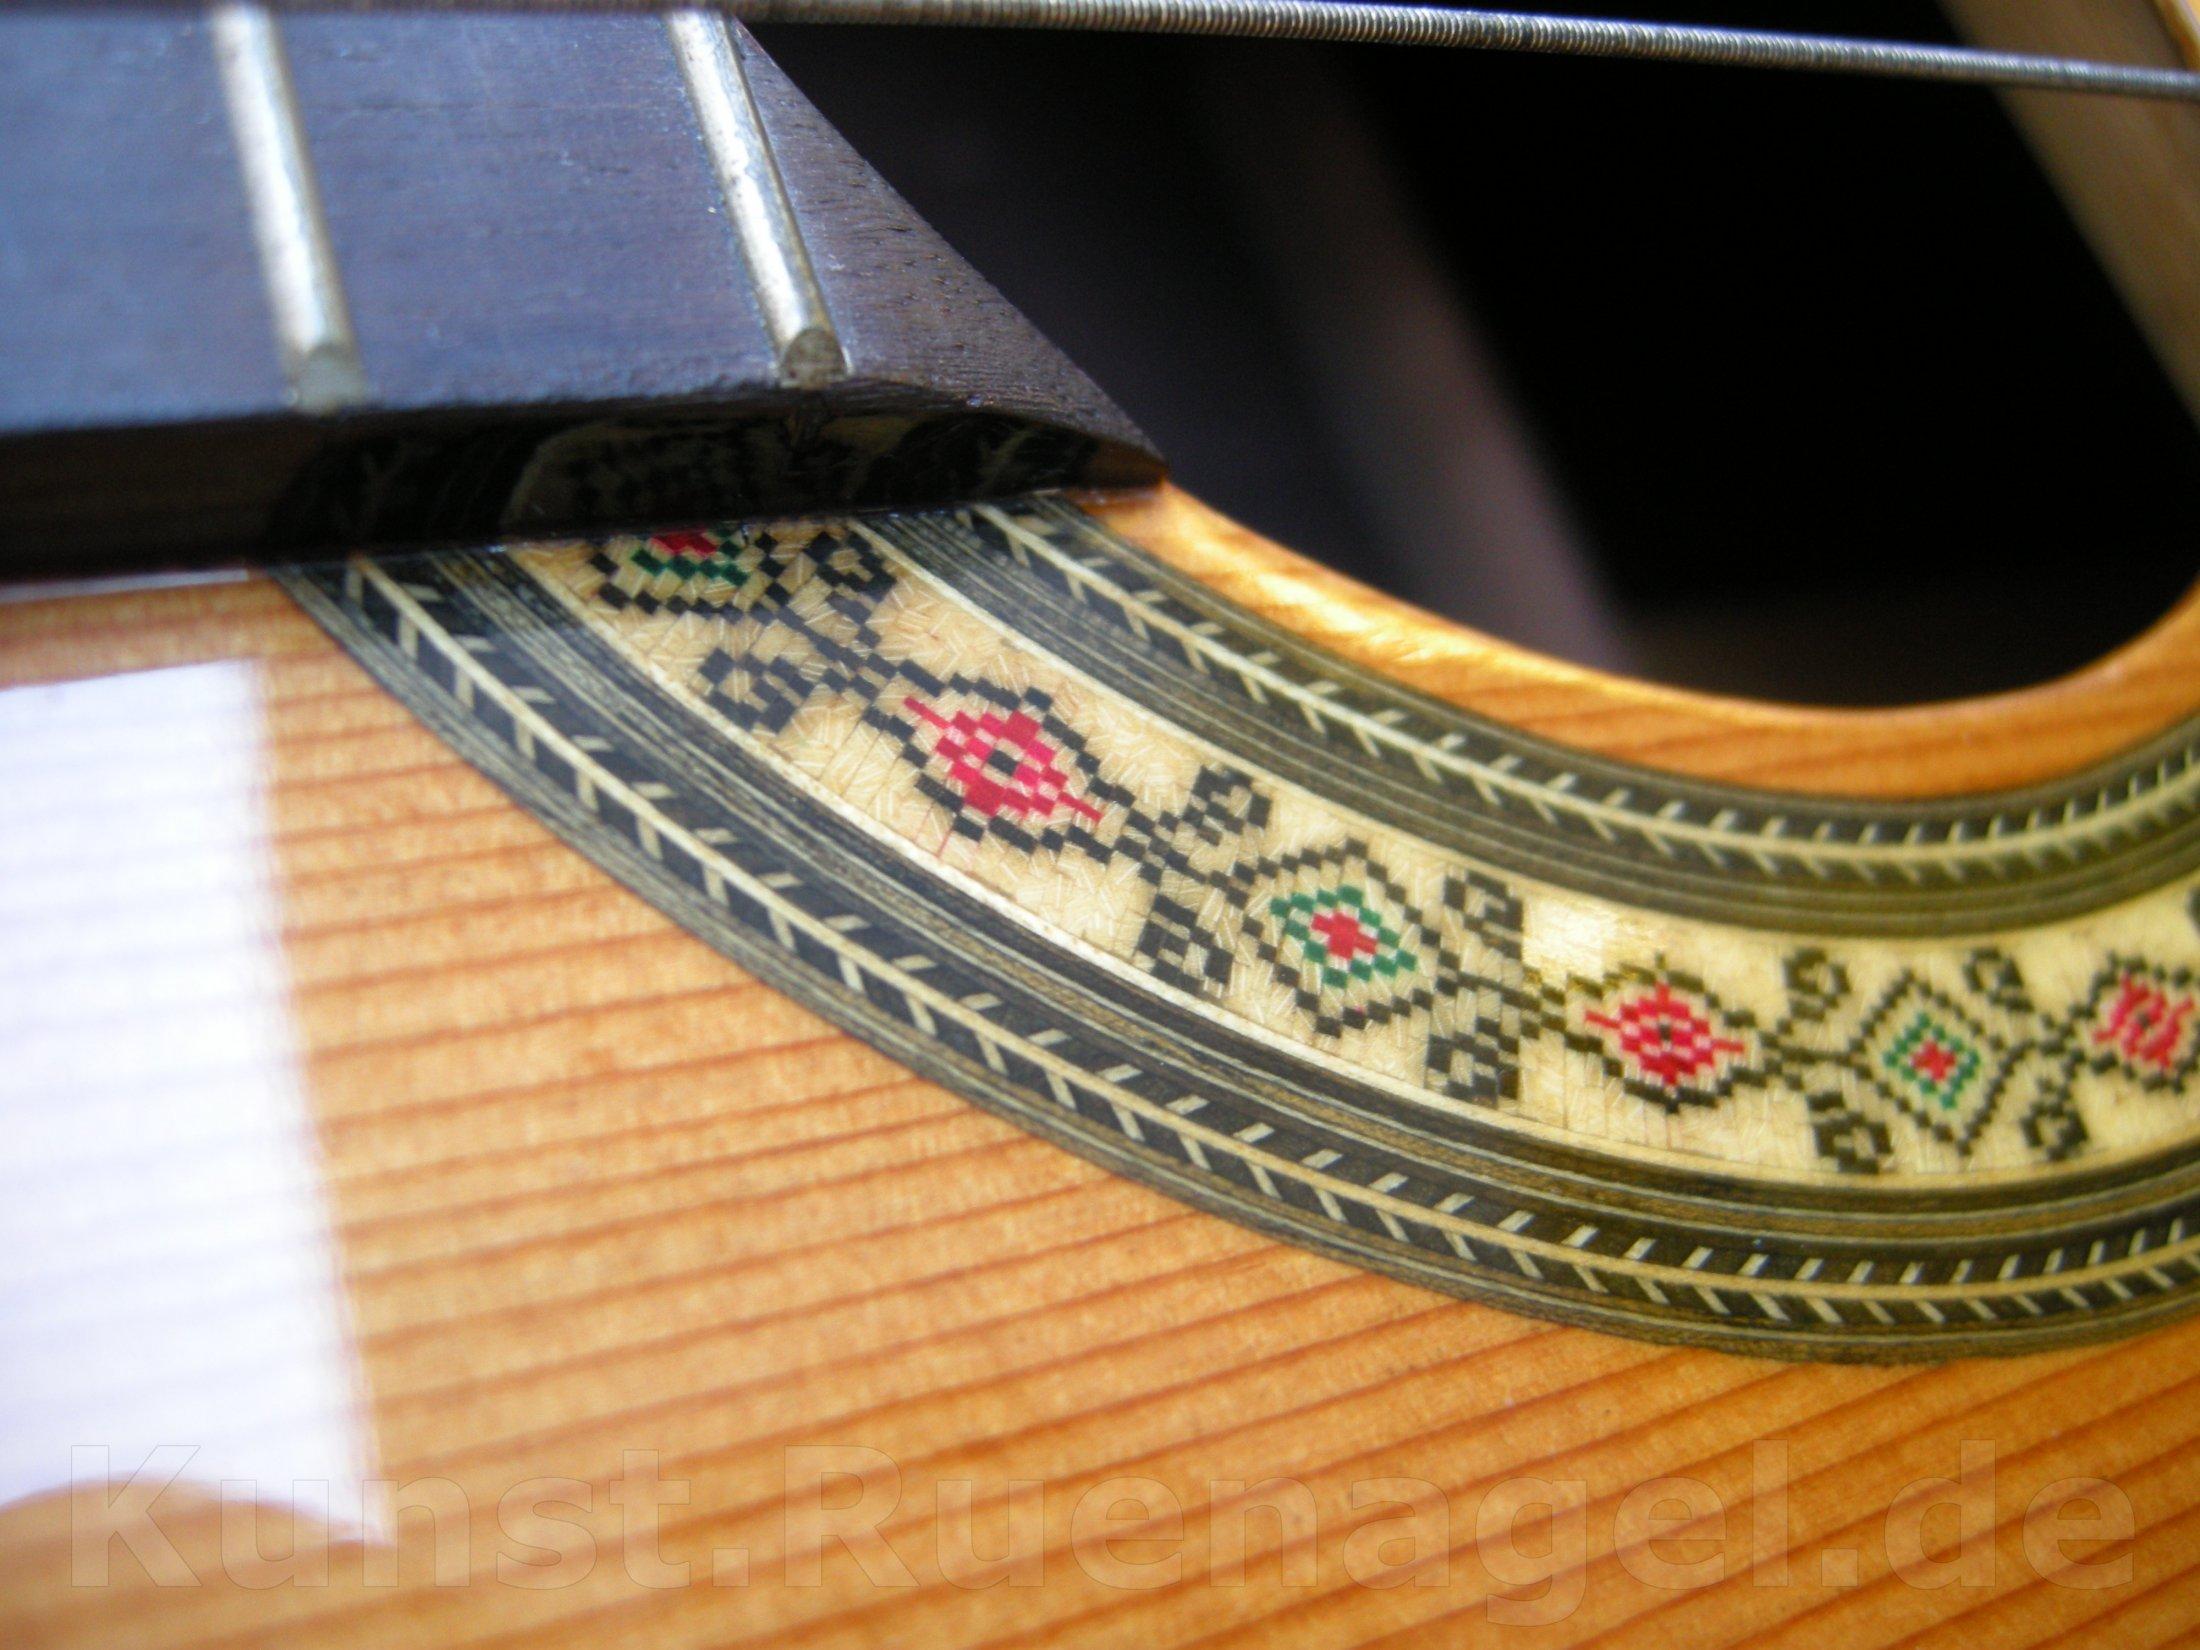 Guitar Juan Orozco Luthier Vintage New York 1979 Musik Intrumente Akkustik Gitarre Rosenheim - Kunst-Ruenagel-de138